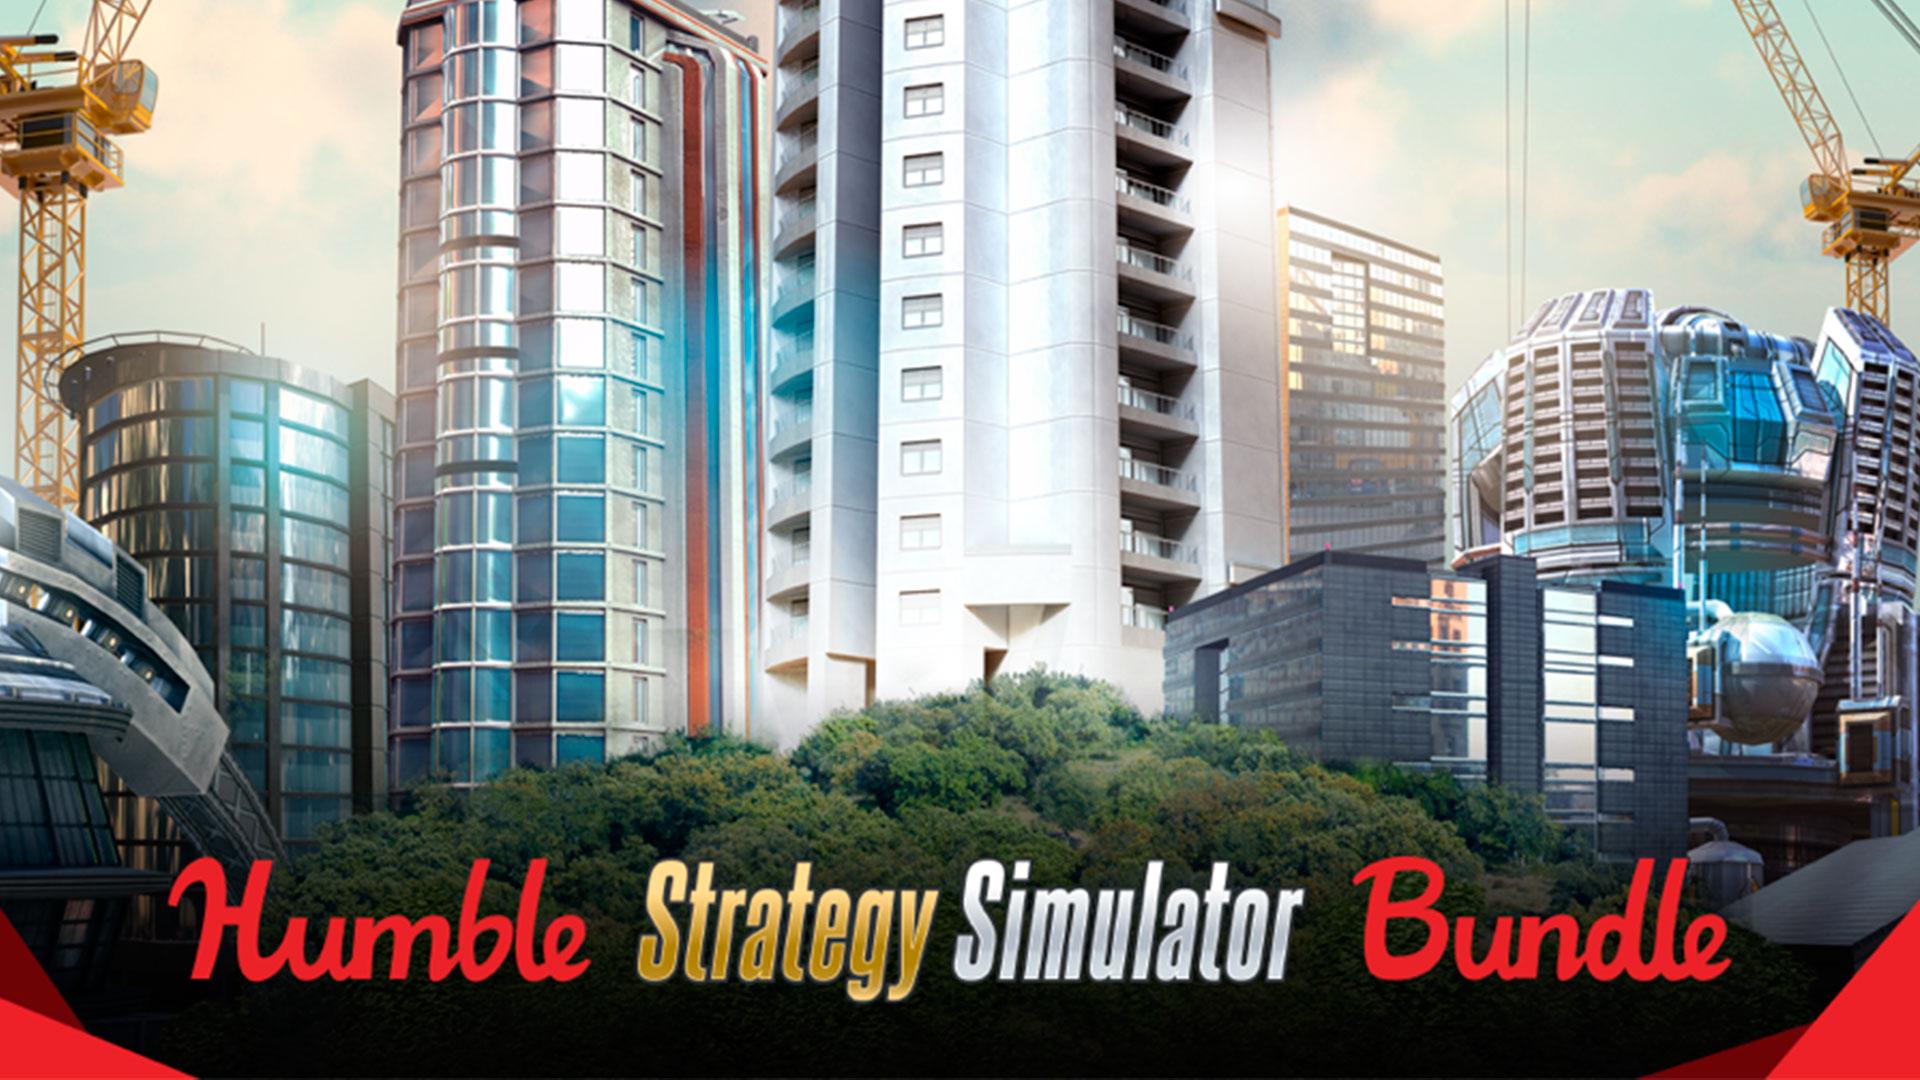 Humble Strategy Simulator